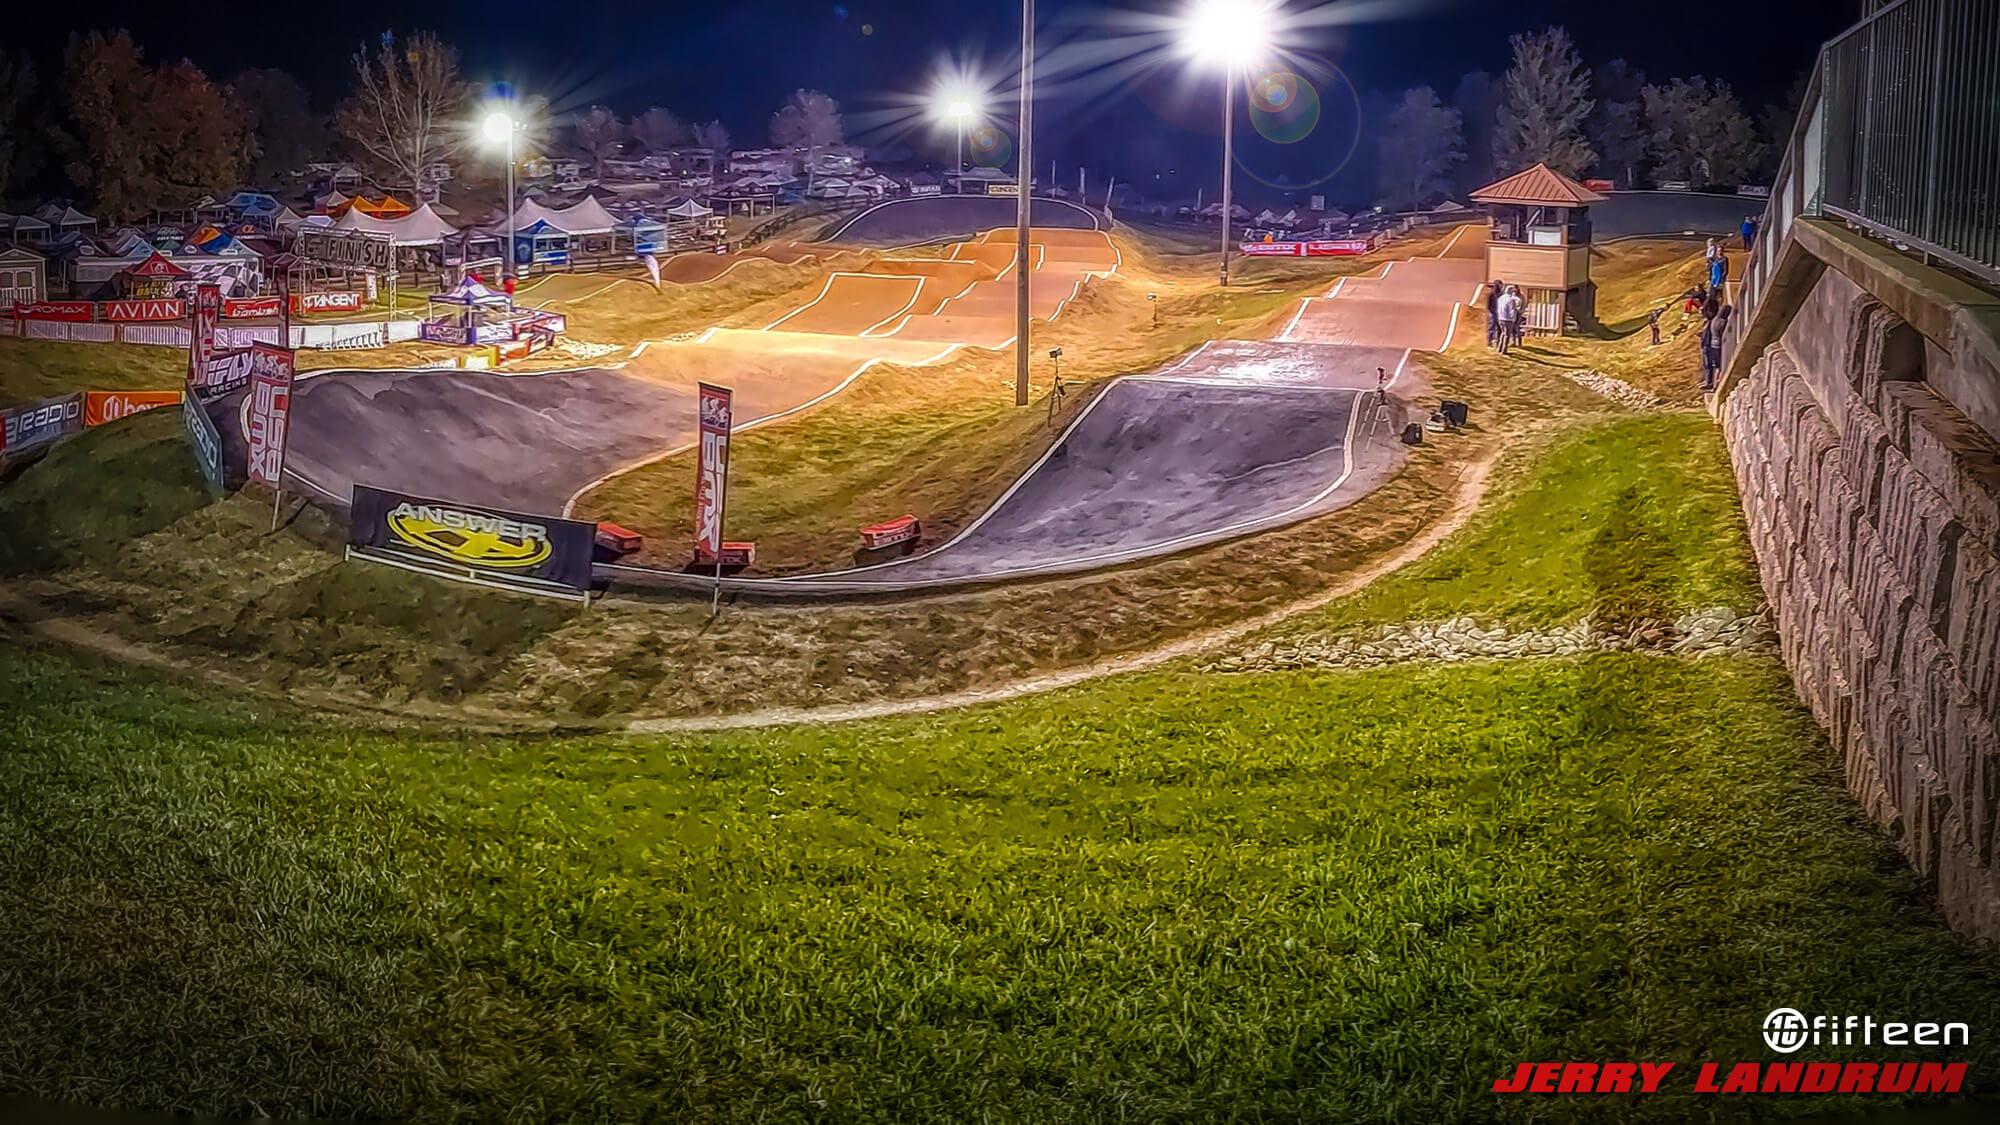 USA BMX Derby City 2020 - Jerry Landrum - Derby City Crop PA